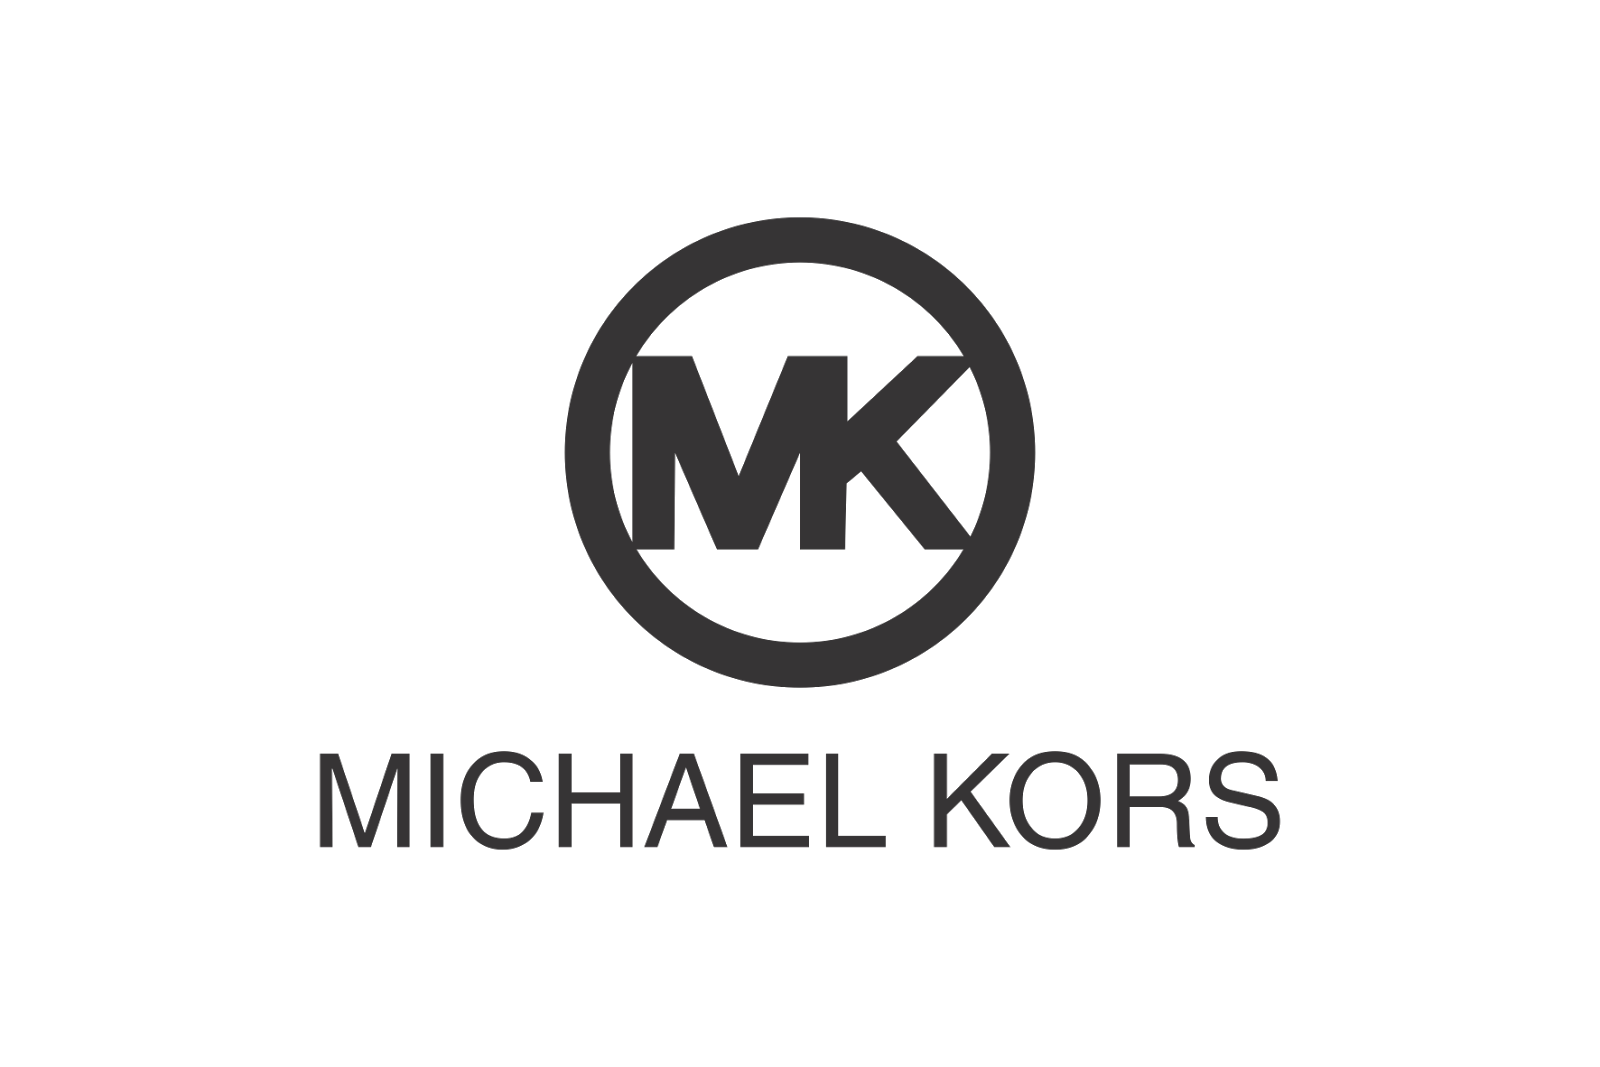 Michael-Kors-logo.png